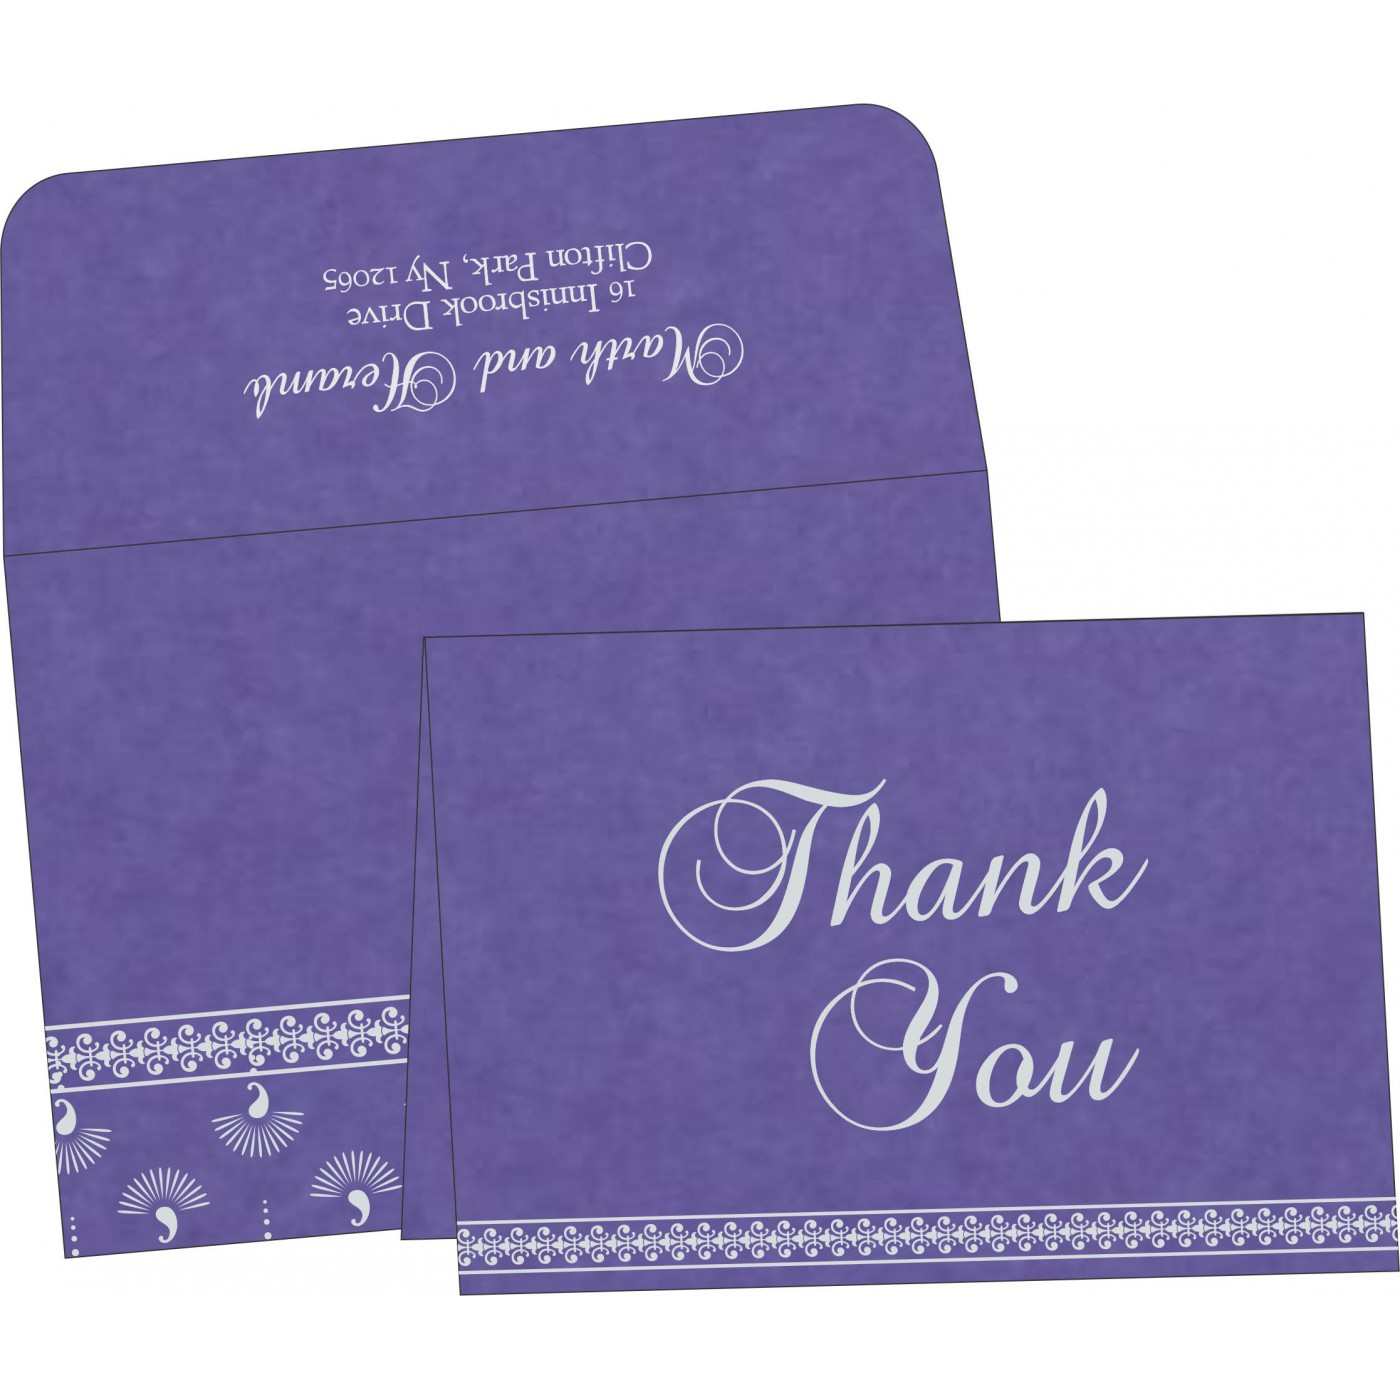 Thank You Cards : TYC-8247C - 123WeddingCards